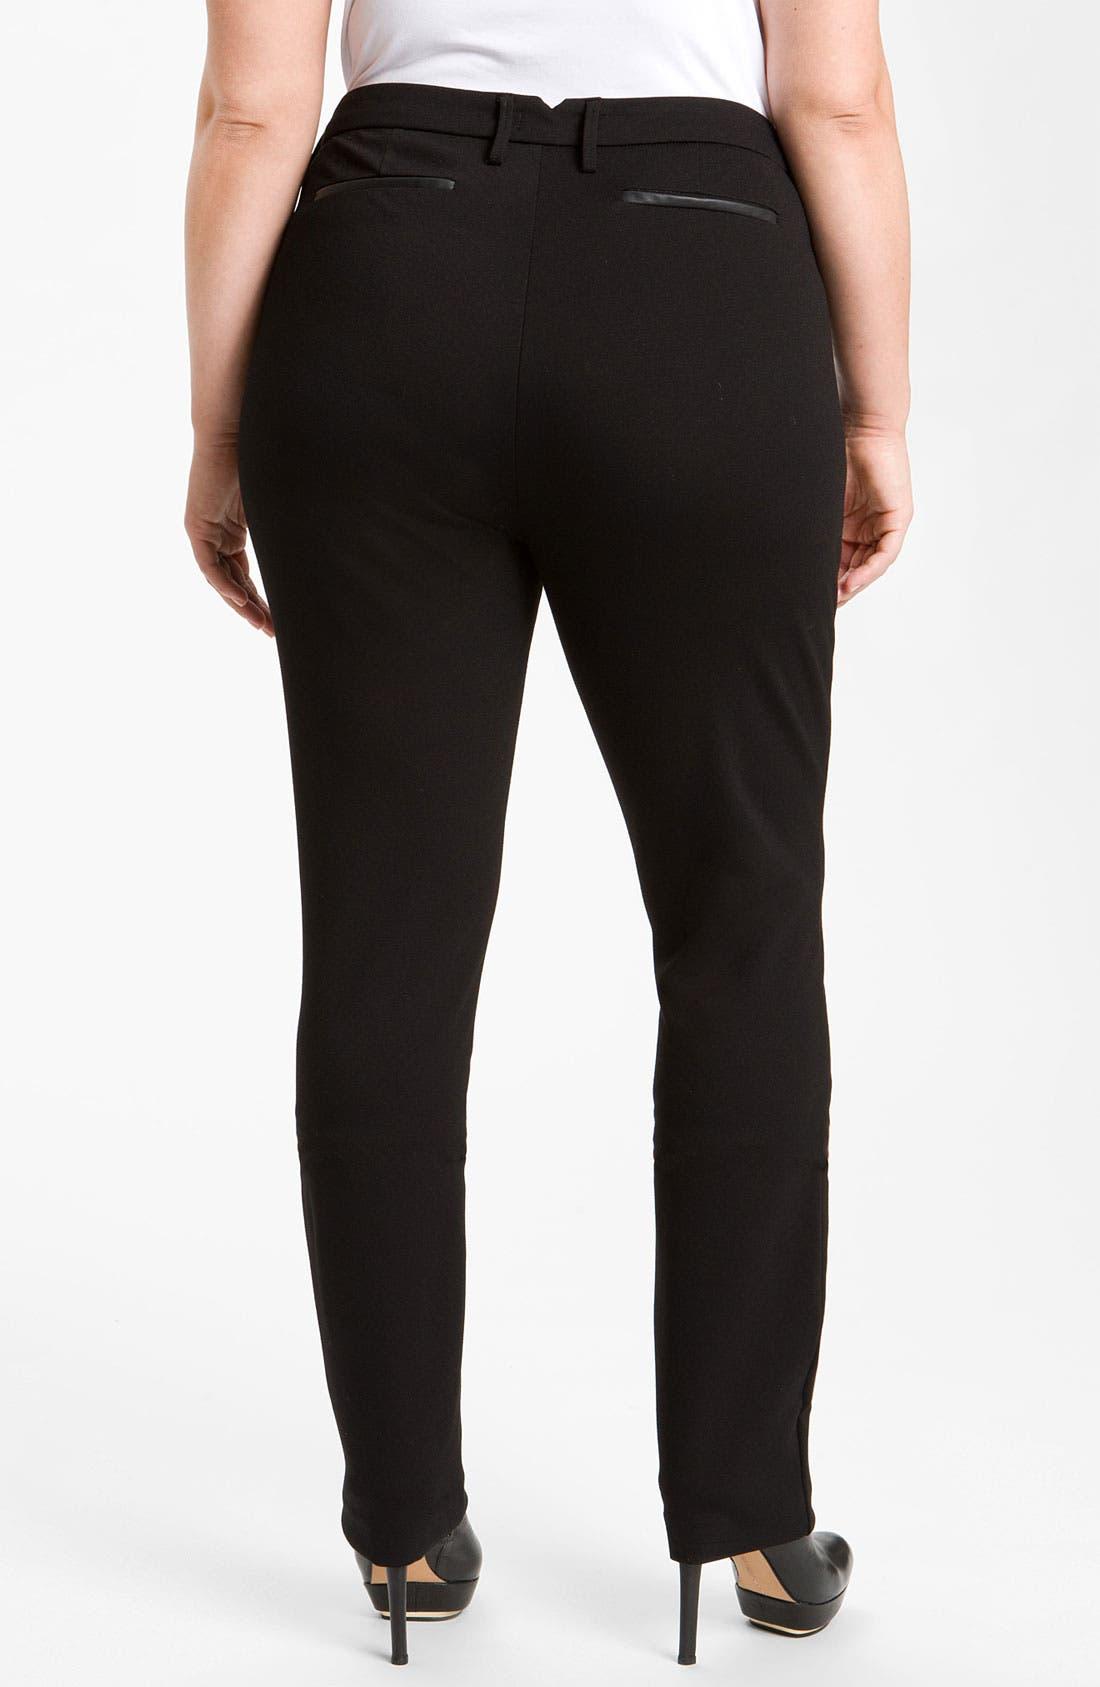 Alternate Image 1 Selected - NYDJ Stretch Ponte Knit Pants (Plus)